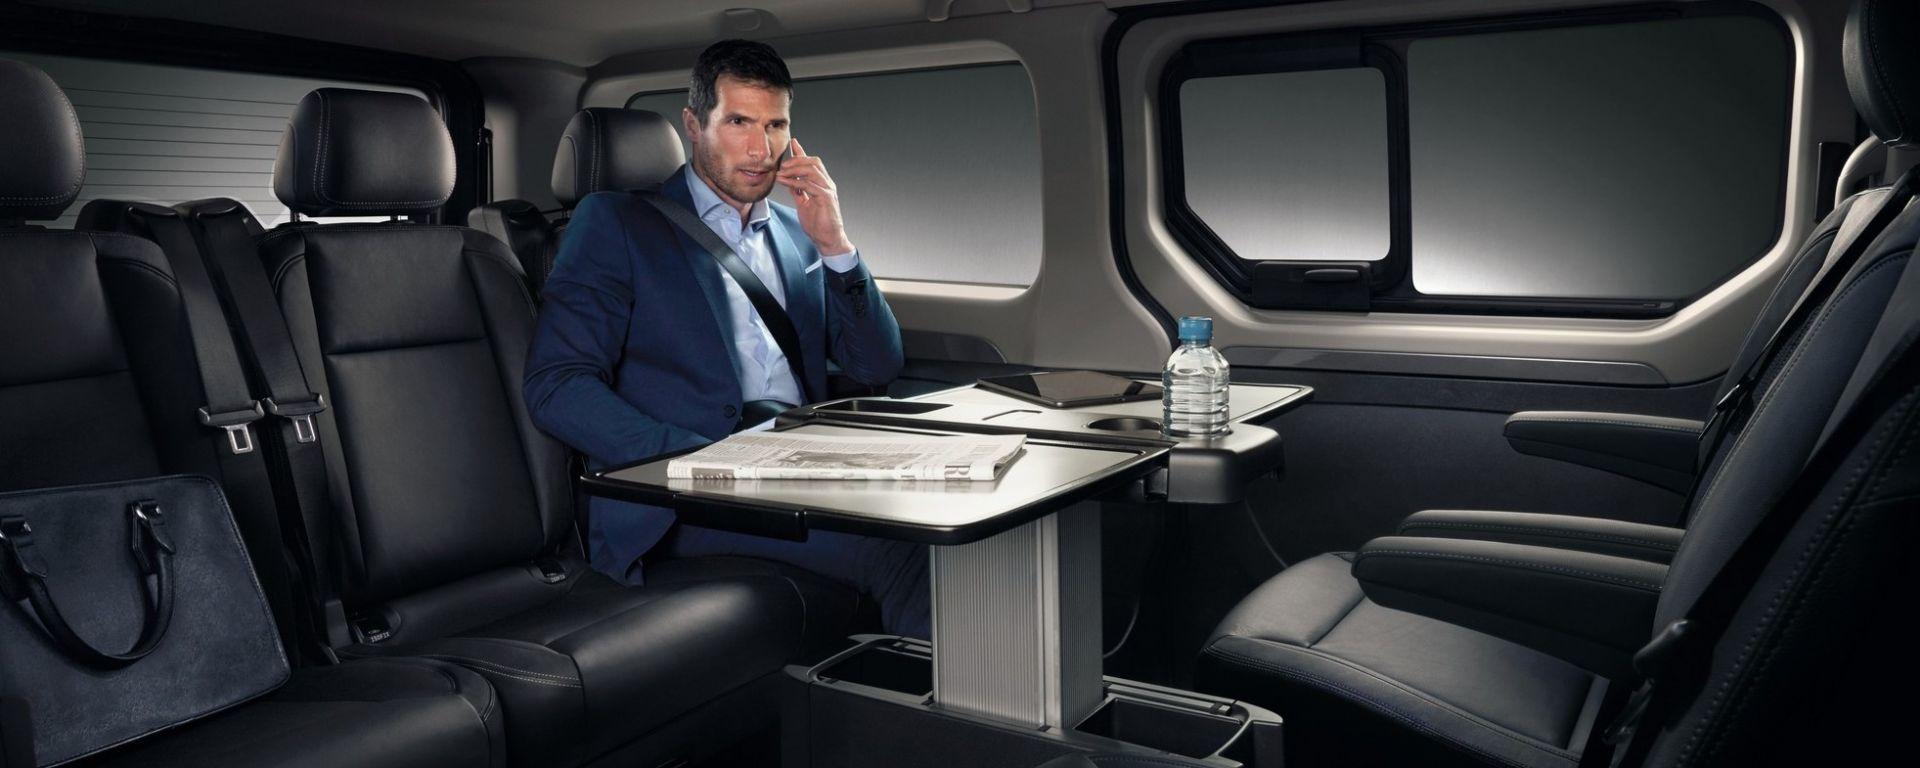 Nuovo Renault Trafic SpaceClass: viaggiare in business